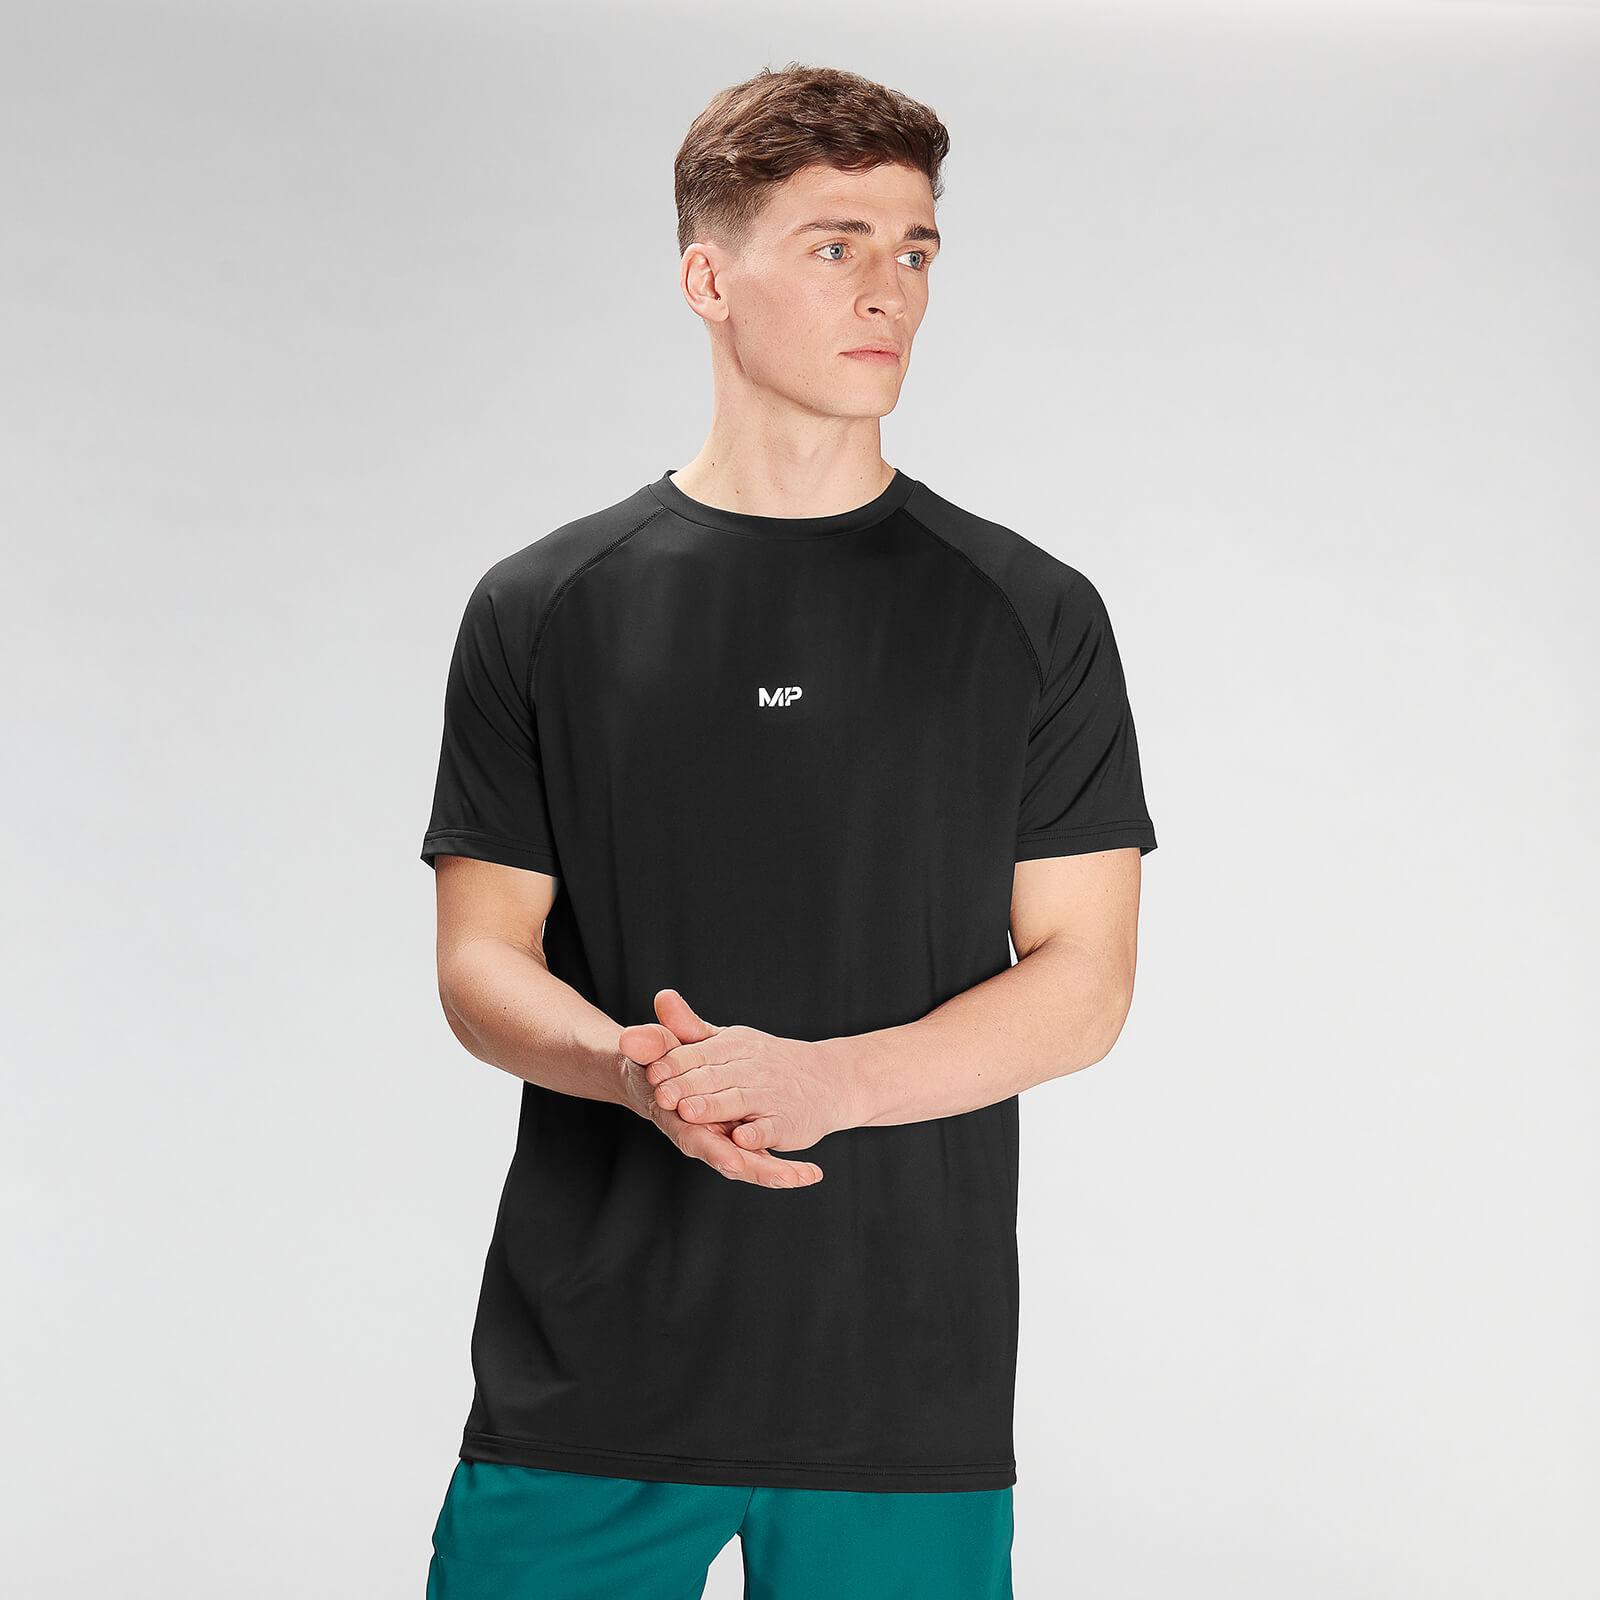 Купить MP Men's Limited Edition Impact Short Sleeve T-Shirt - Black - XXL, Myprotein International